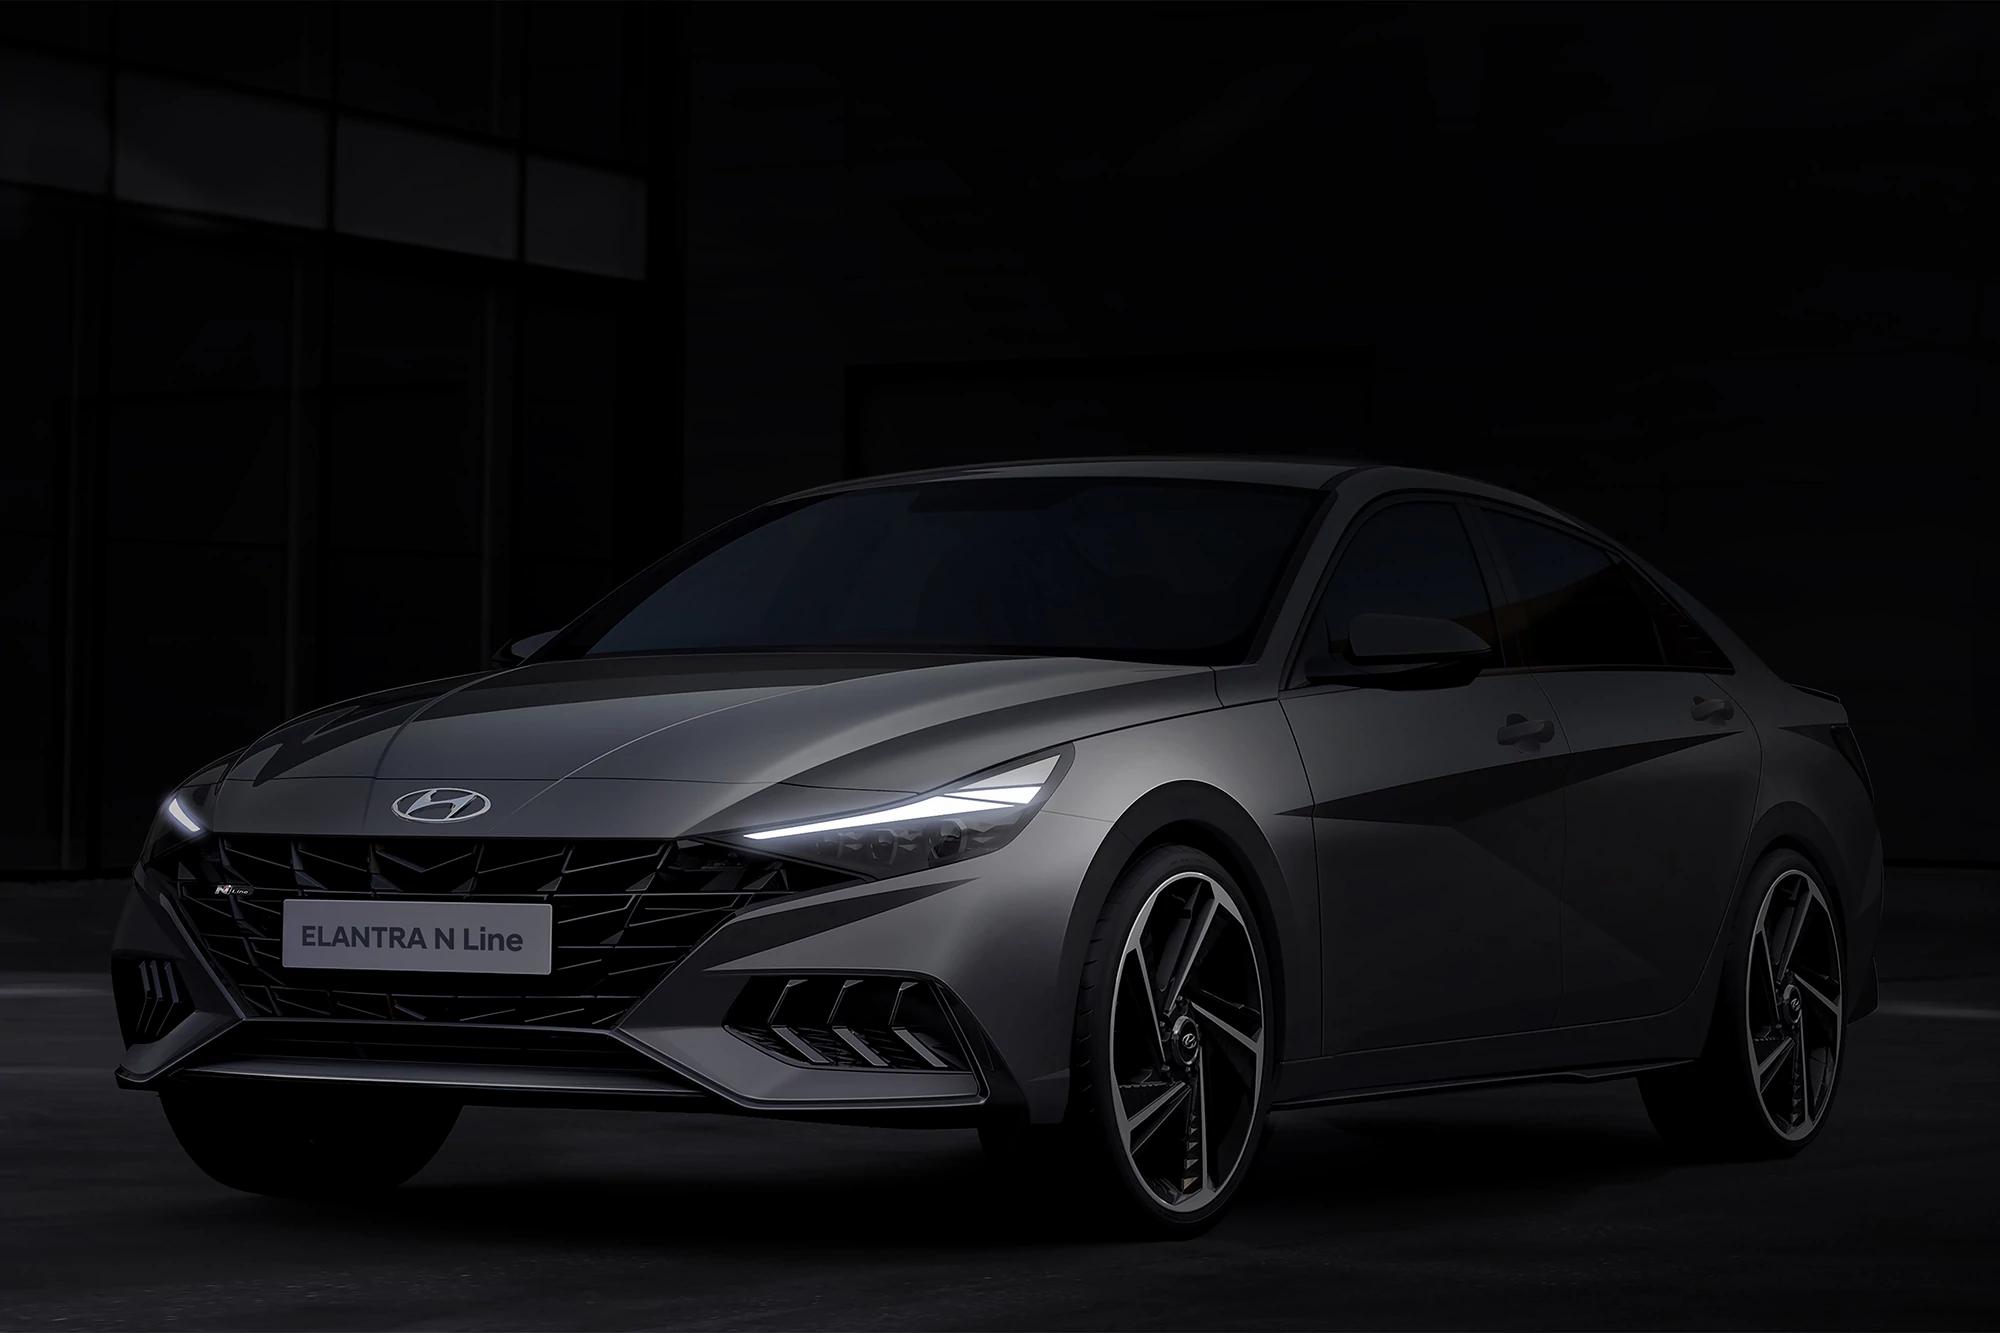 2021 Hyundai Elantra Gets Mean-Mugging N Line Treatment